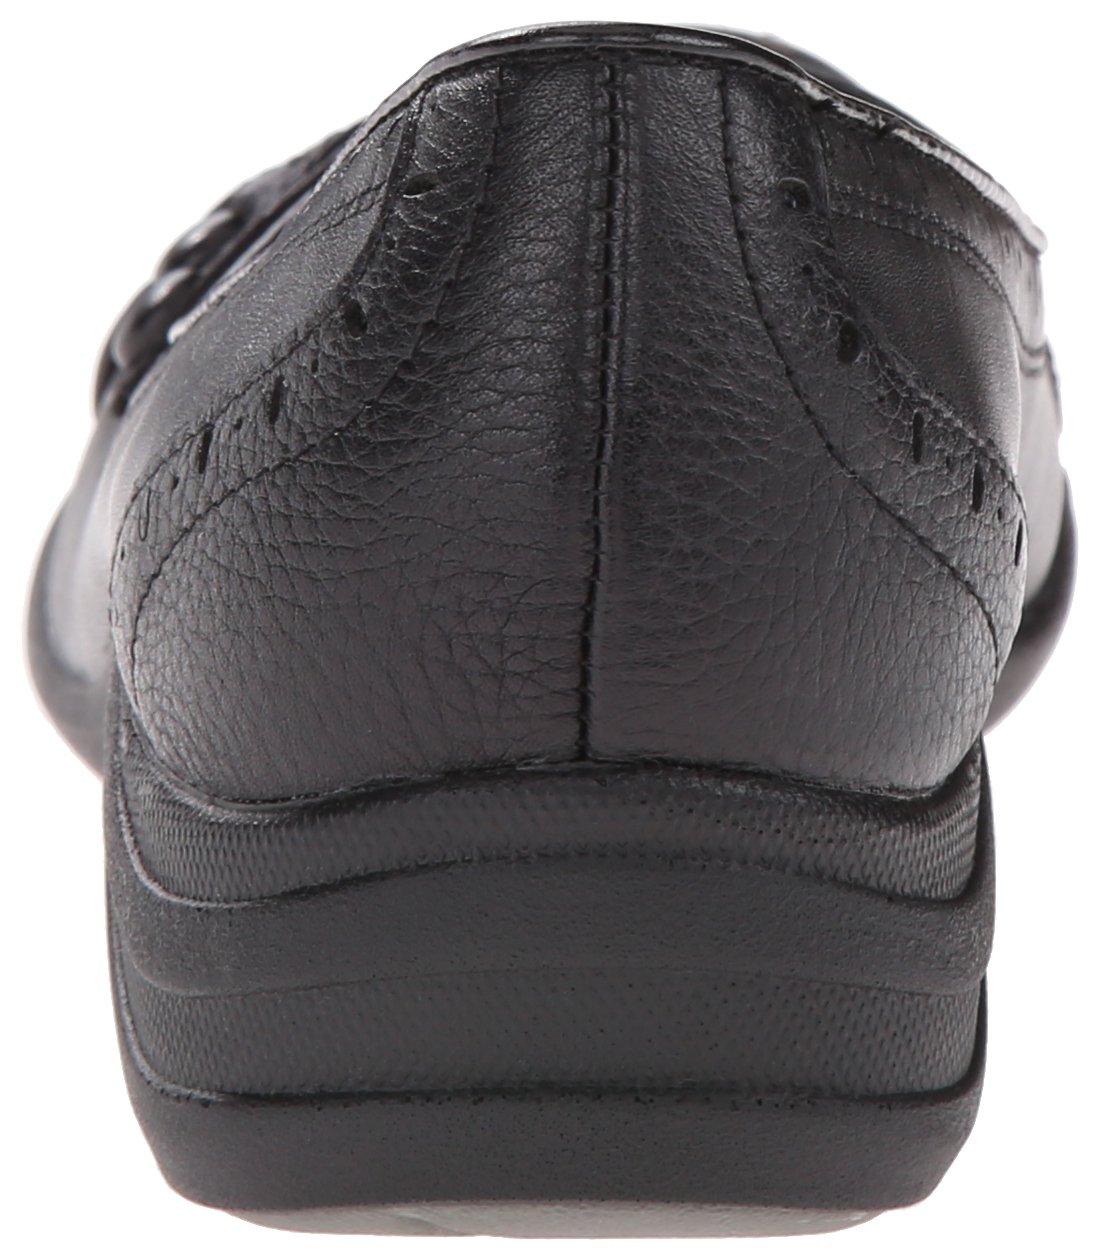 Hush B002RPMX9C Puppies Burlesque B002RPMX9C Hush 7 E US|Black Leather 0bb4ad